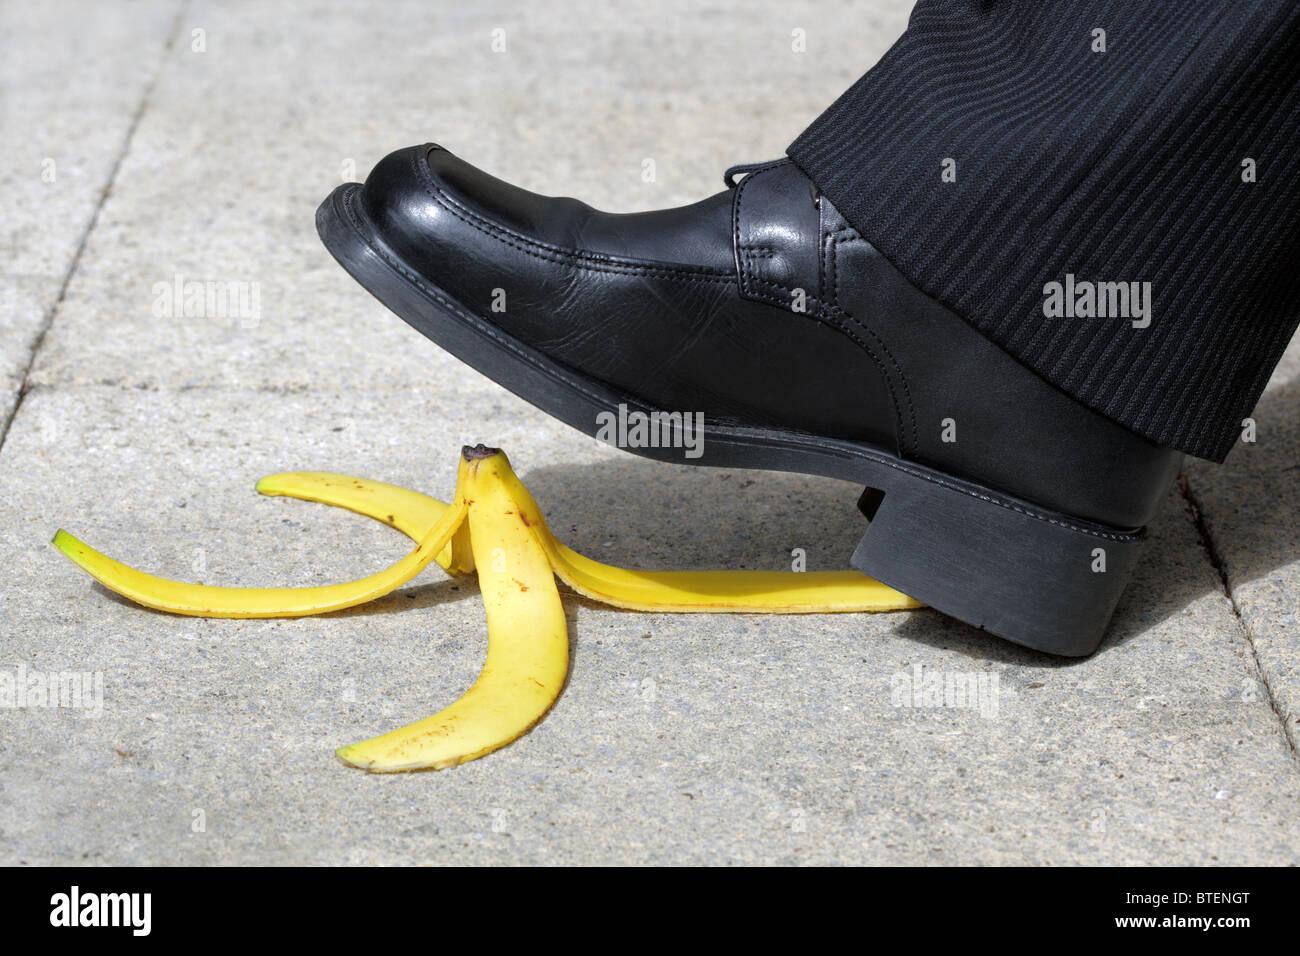 Falling on a banana skin - Stock Image